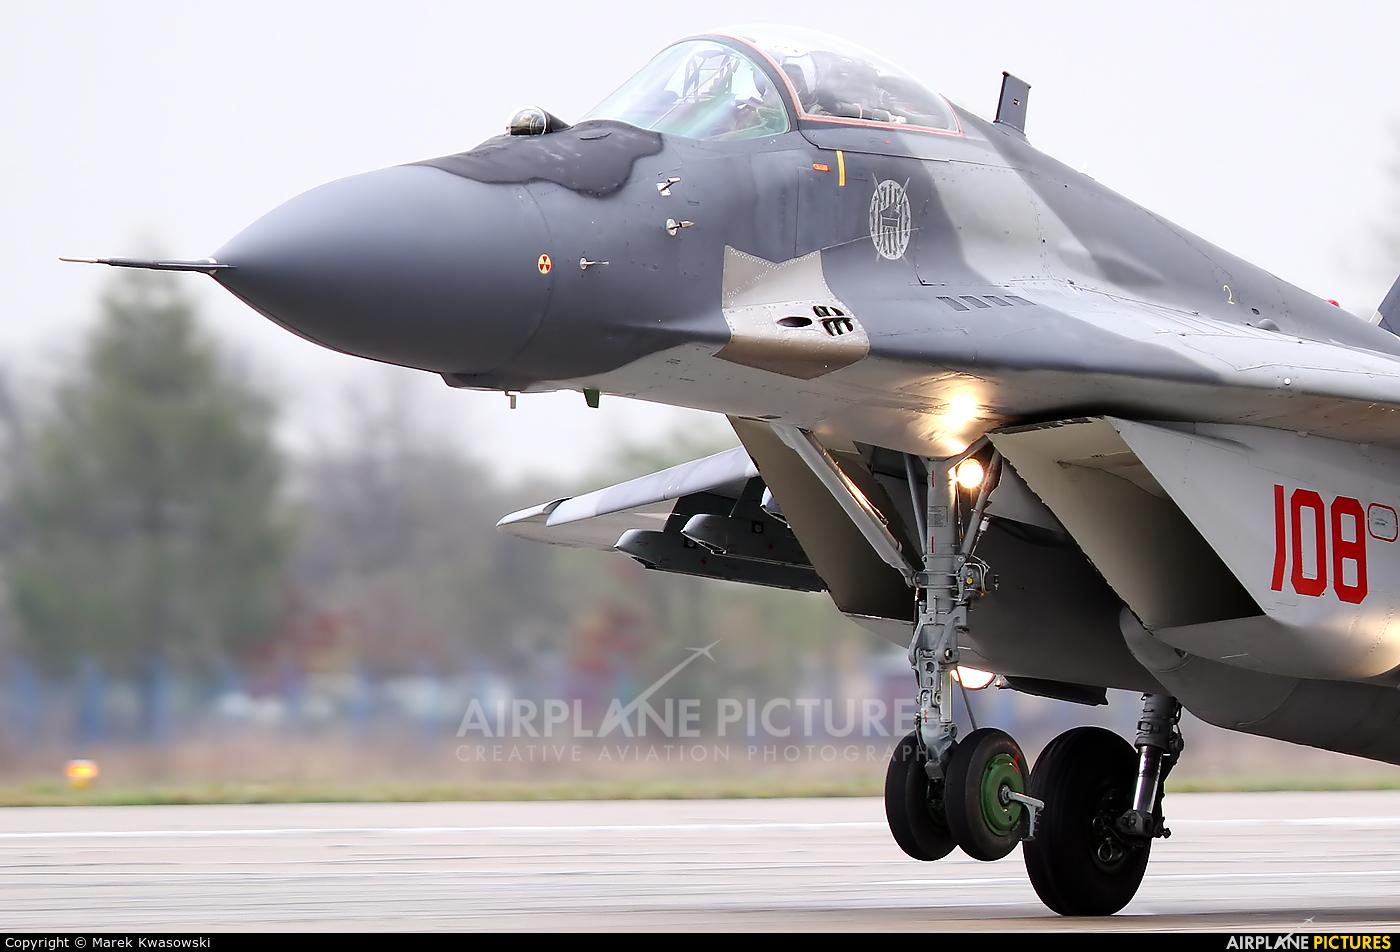 Poland - Air Force 108 aircraft at Mińsk Mazowiecki